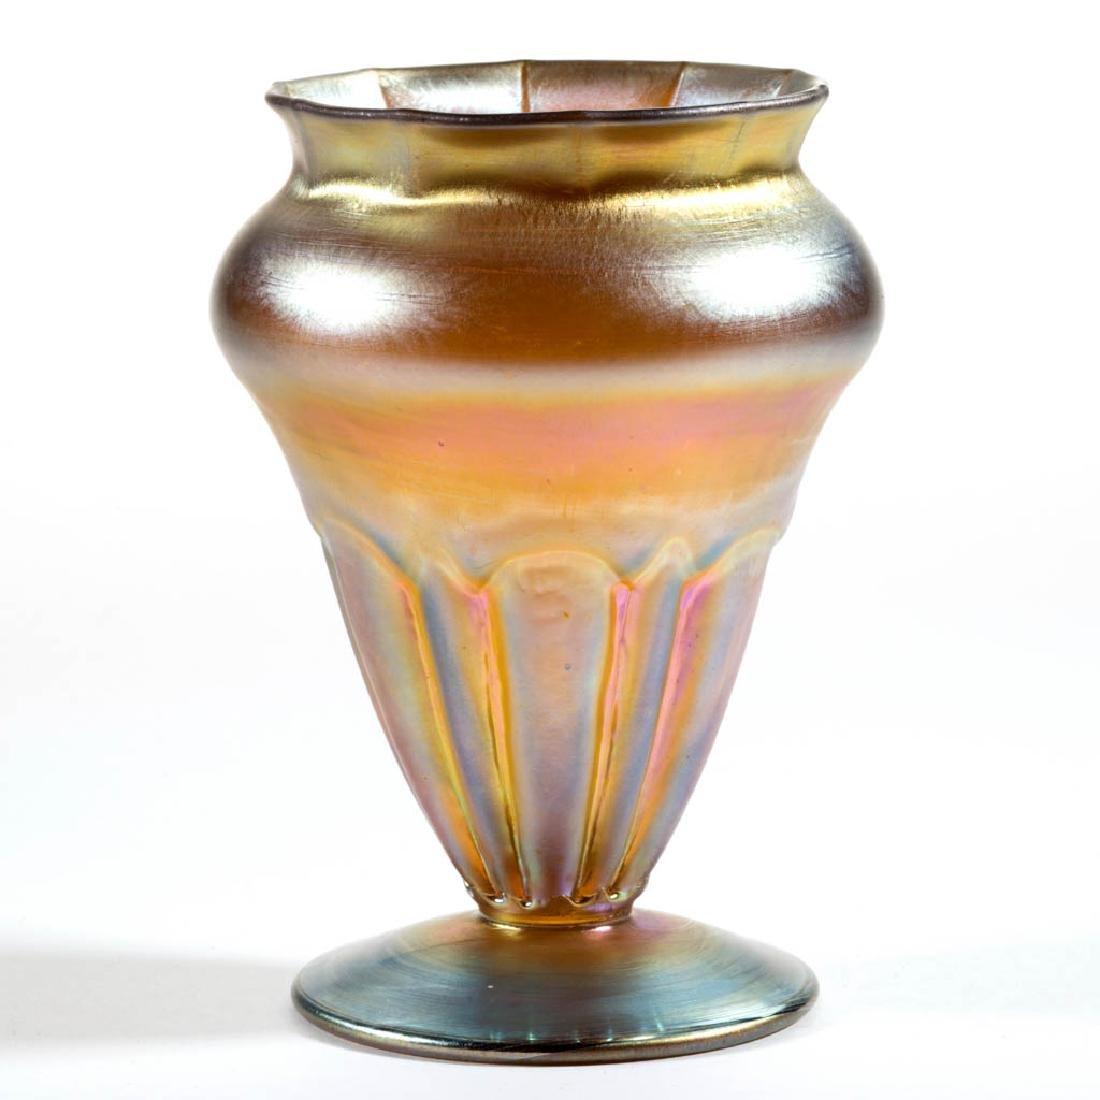 NASH MOLDED IRIDESCENT ART GLASS VASE